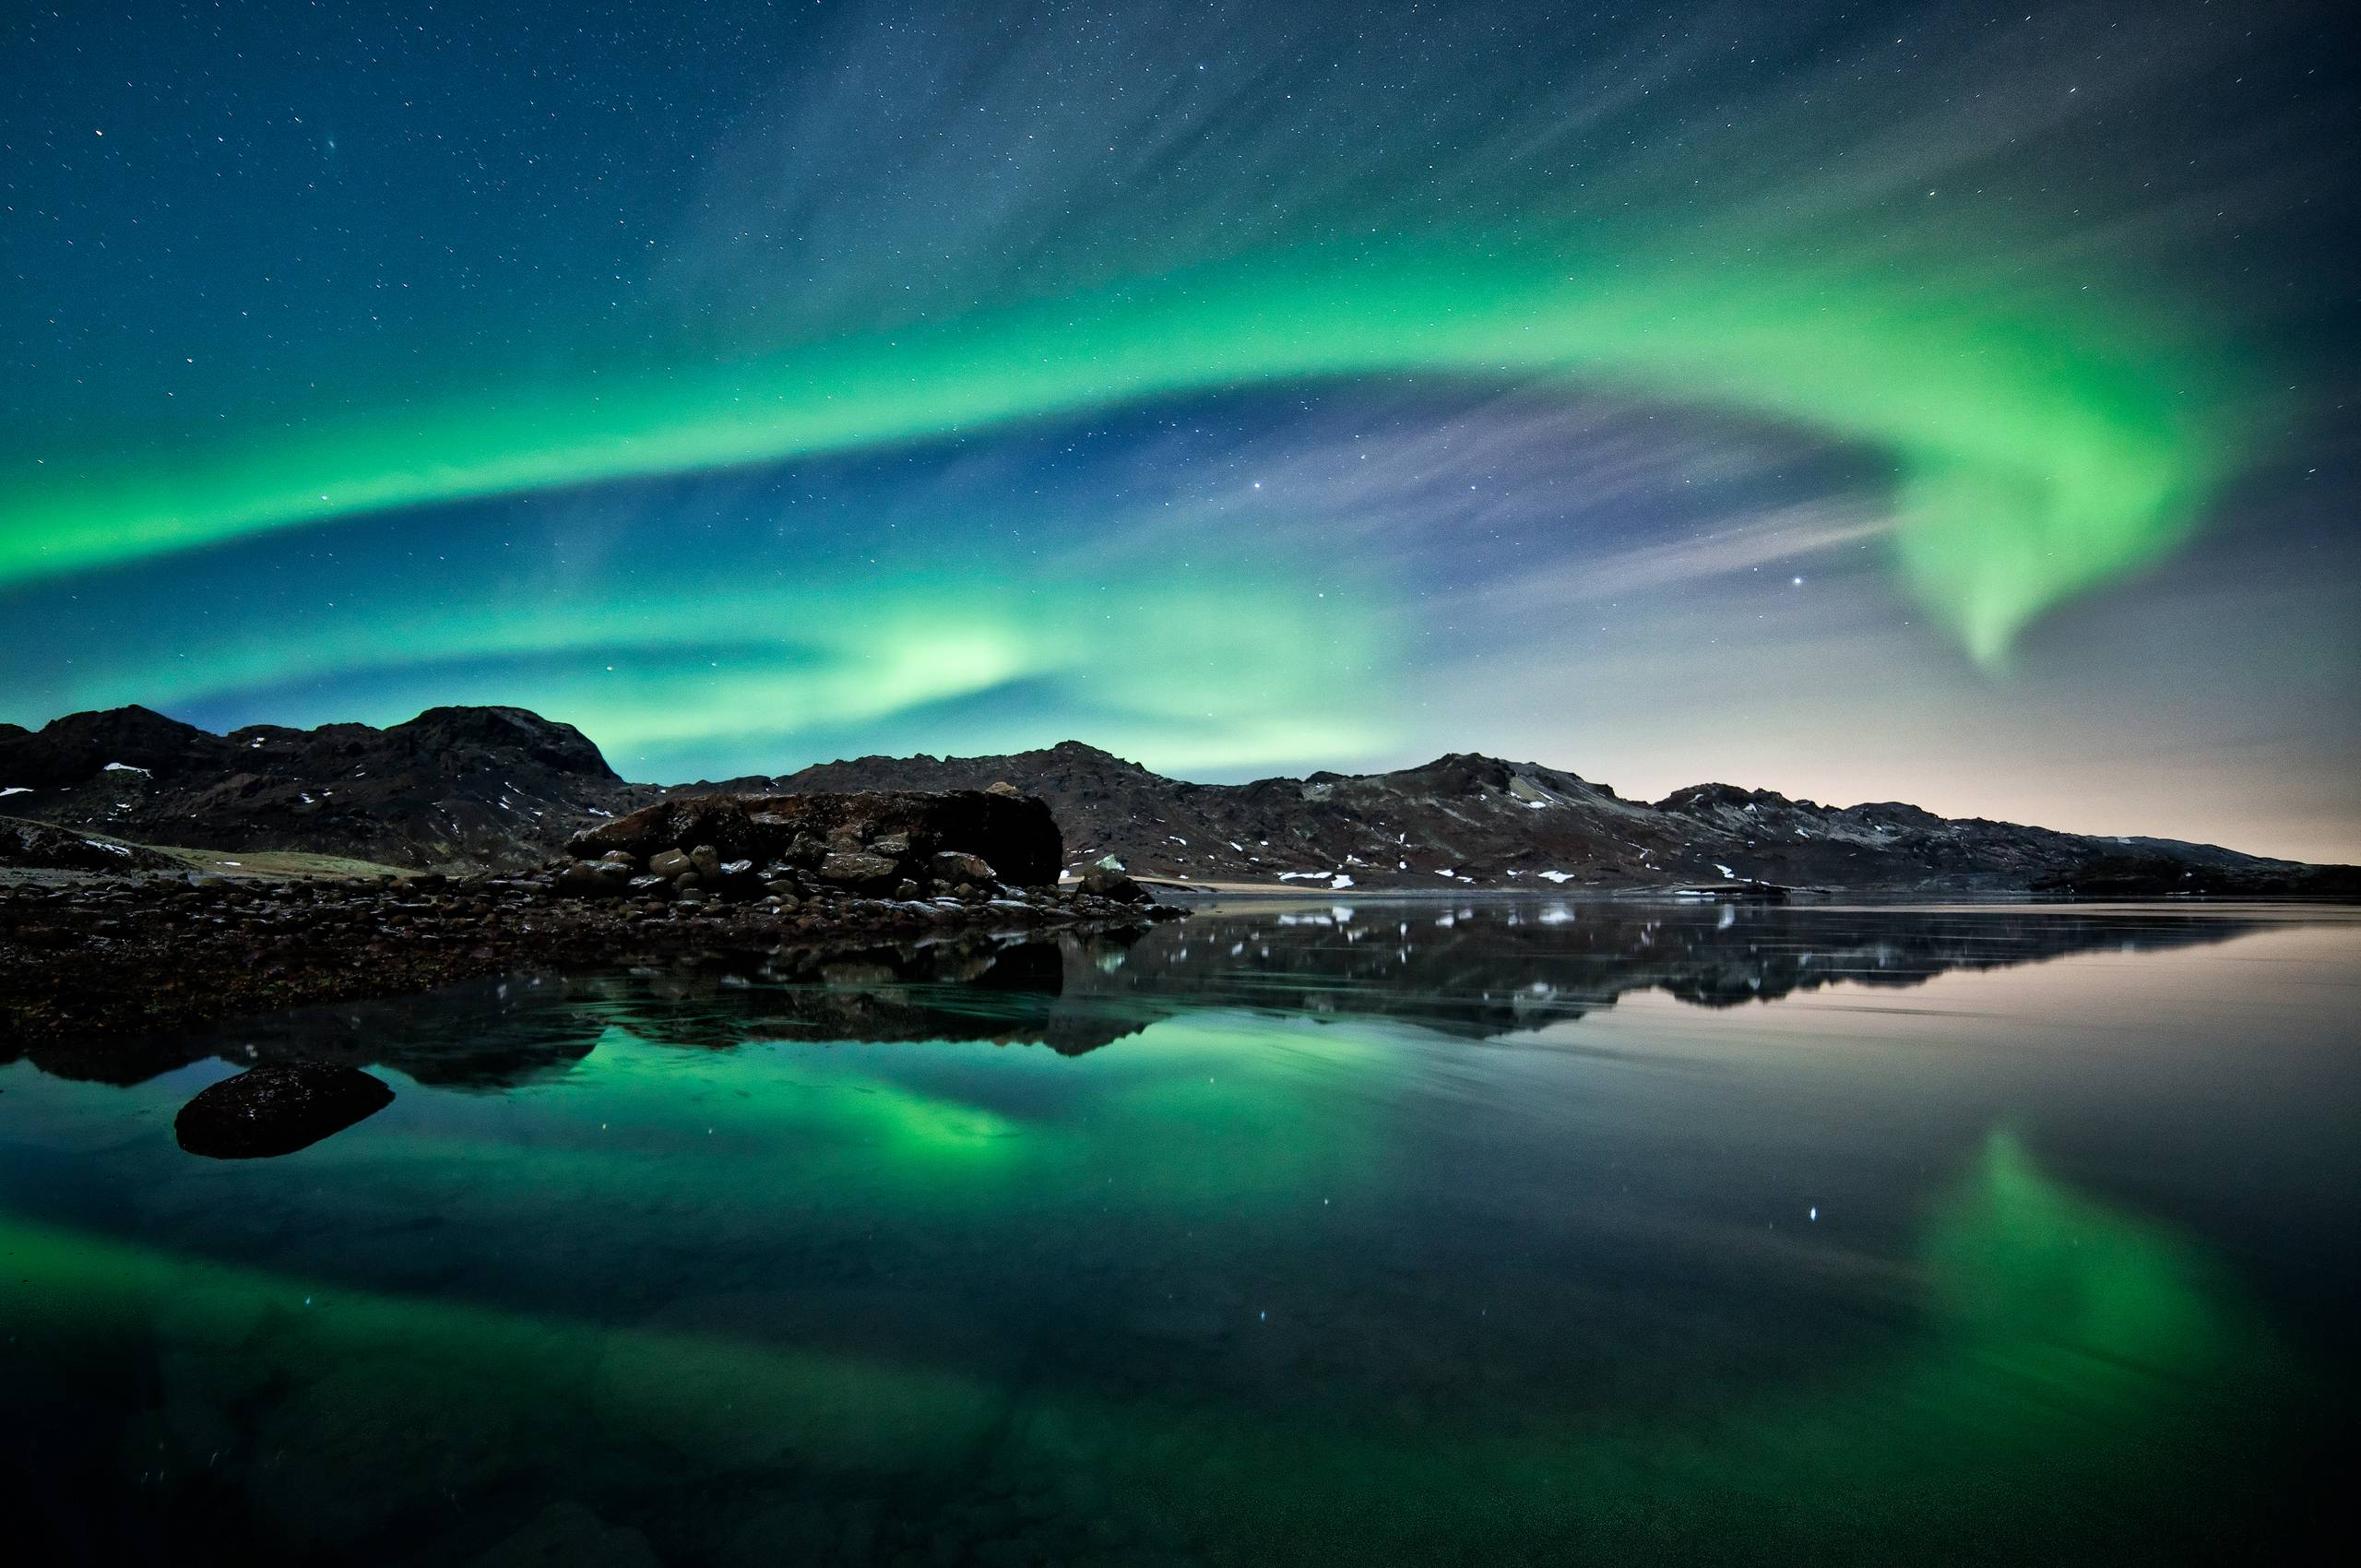 Aurora borealis wallpapers hd wallpaper cave for Foto spettacolari per desktop